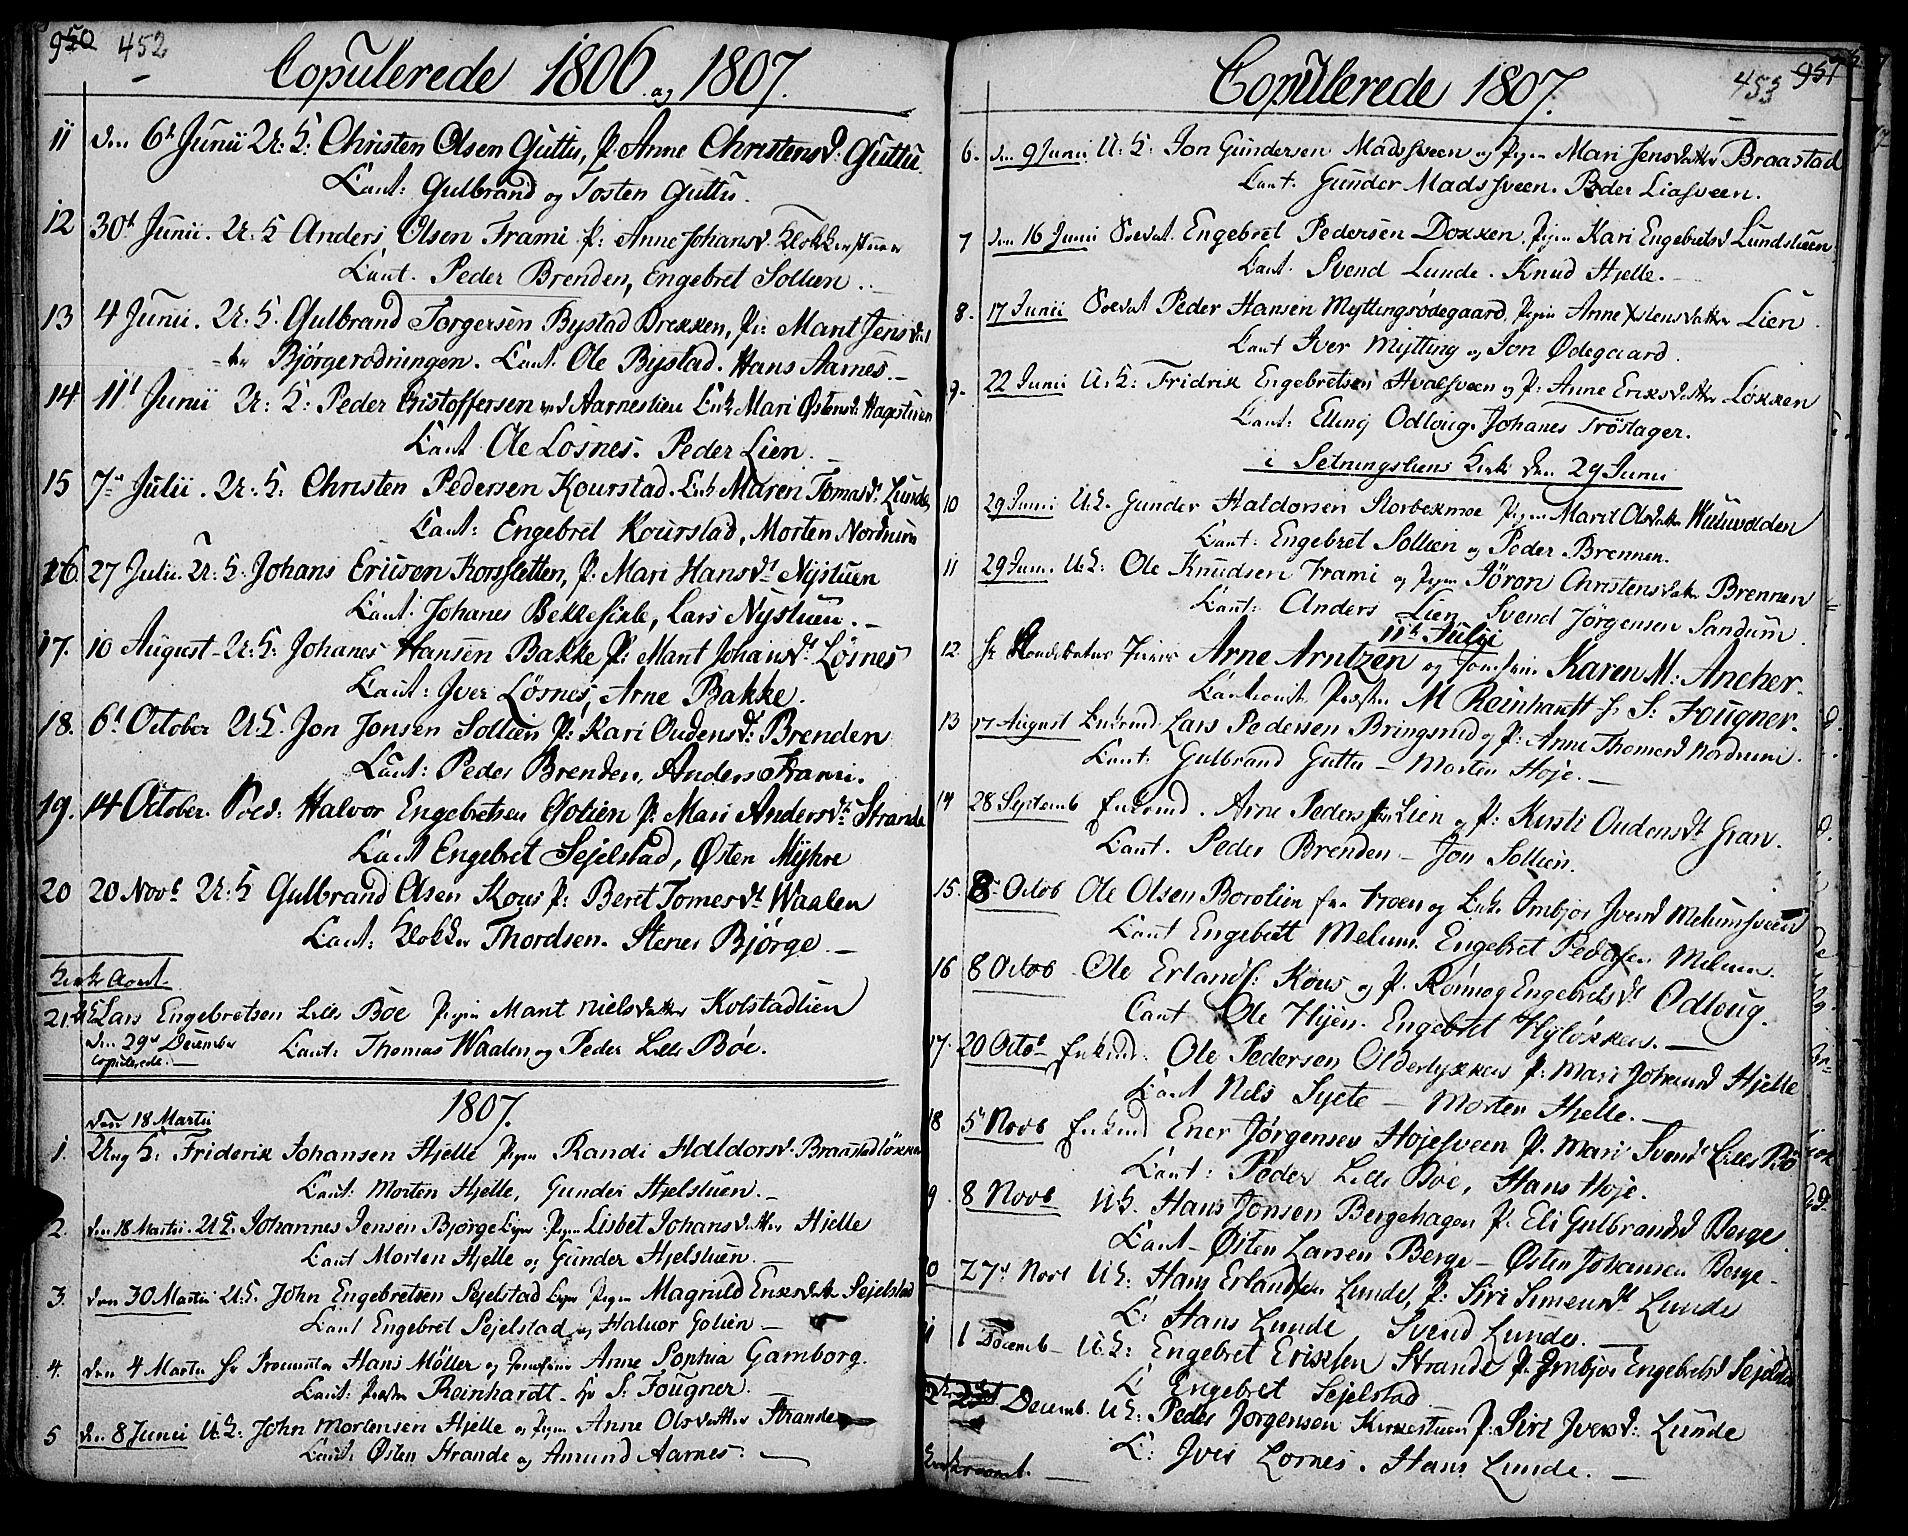 SAH, Ringebu prestekontor, Ministerialbok nr. 3, 1781-1820, s. 452-453